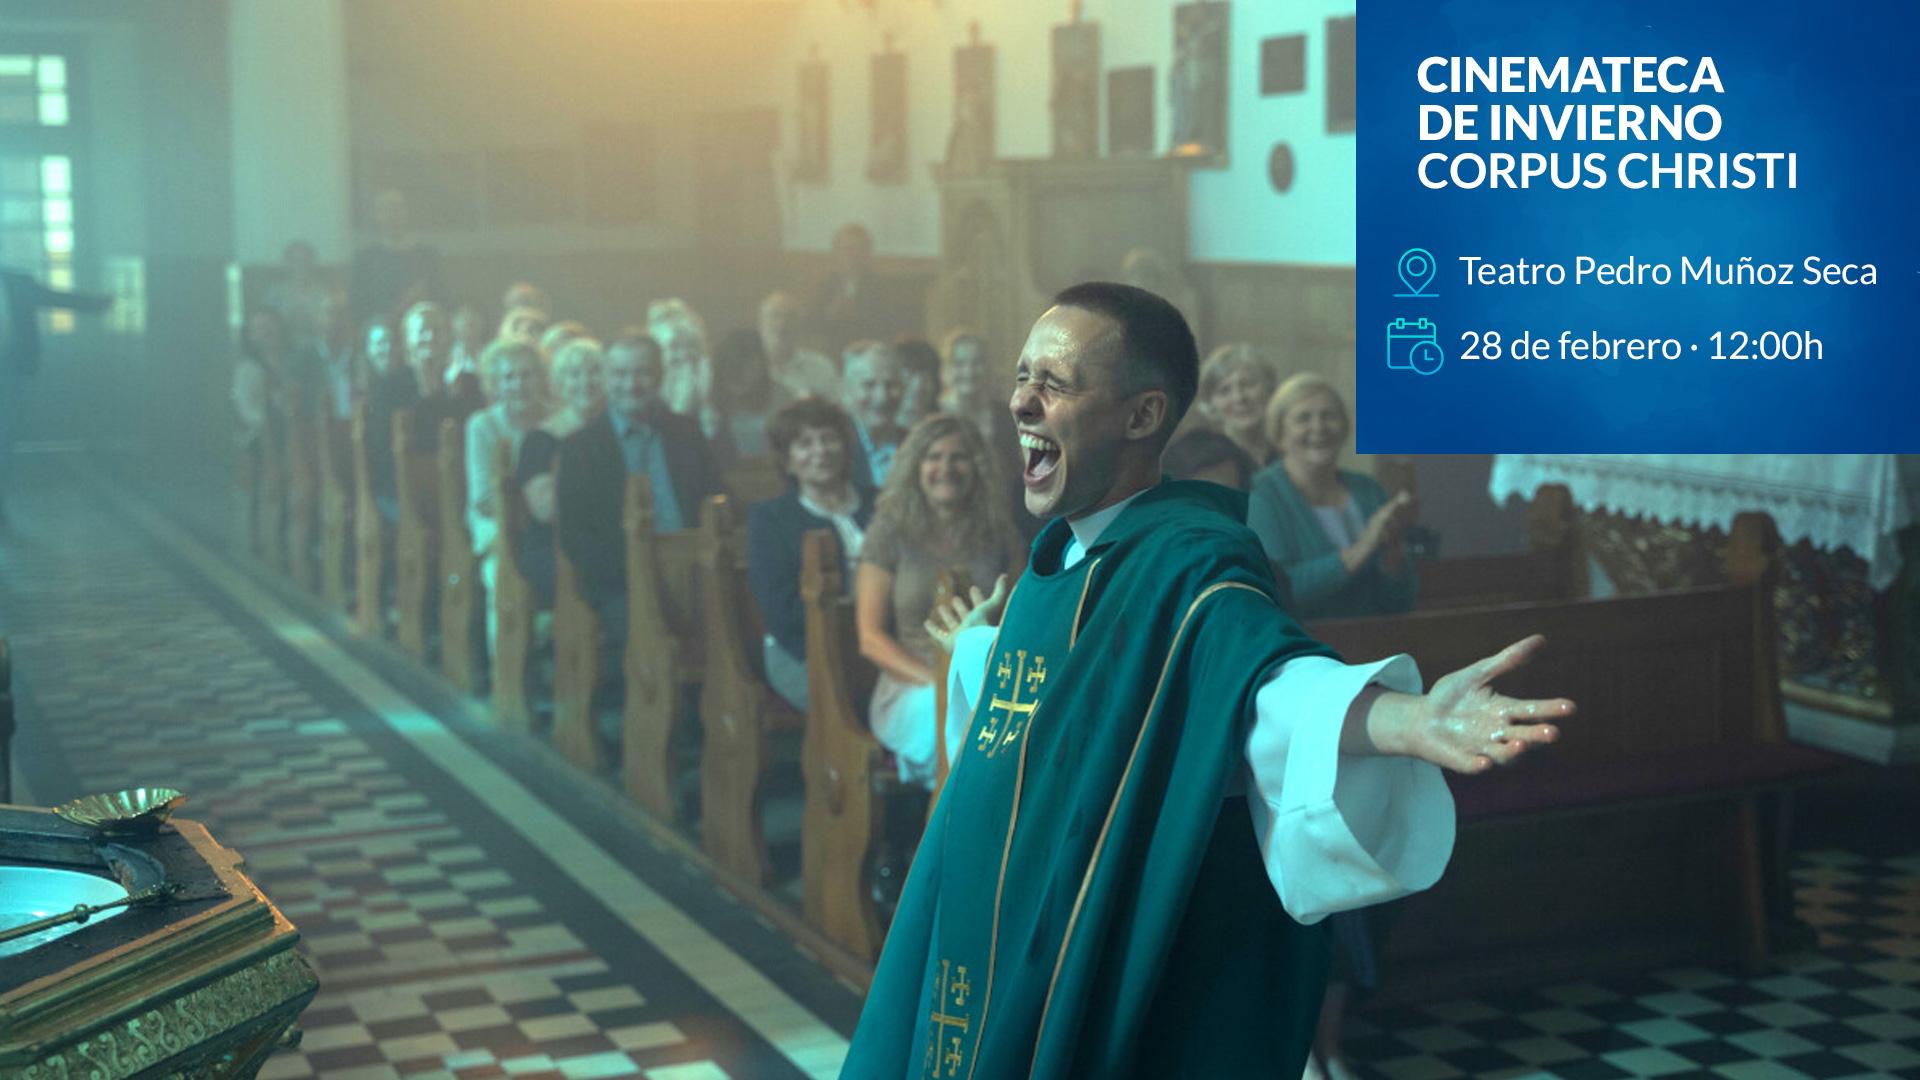 Cinemateca. Corpus Christi